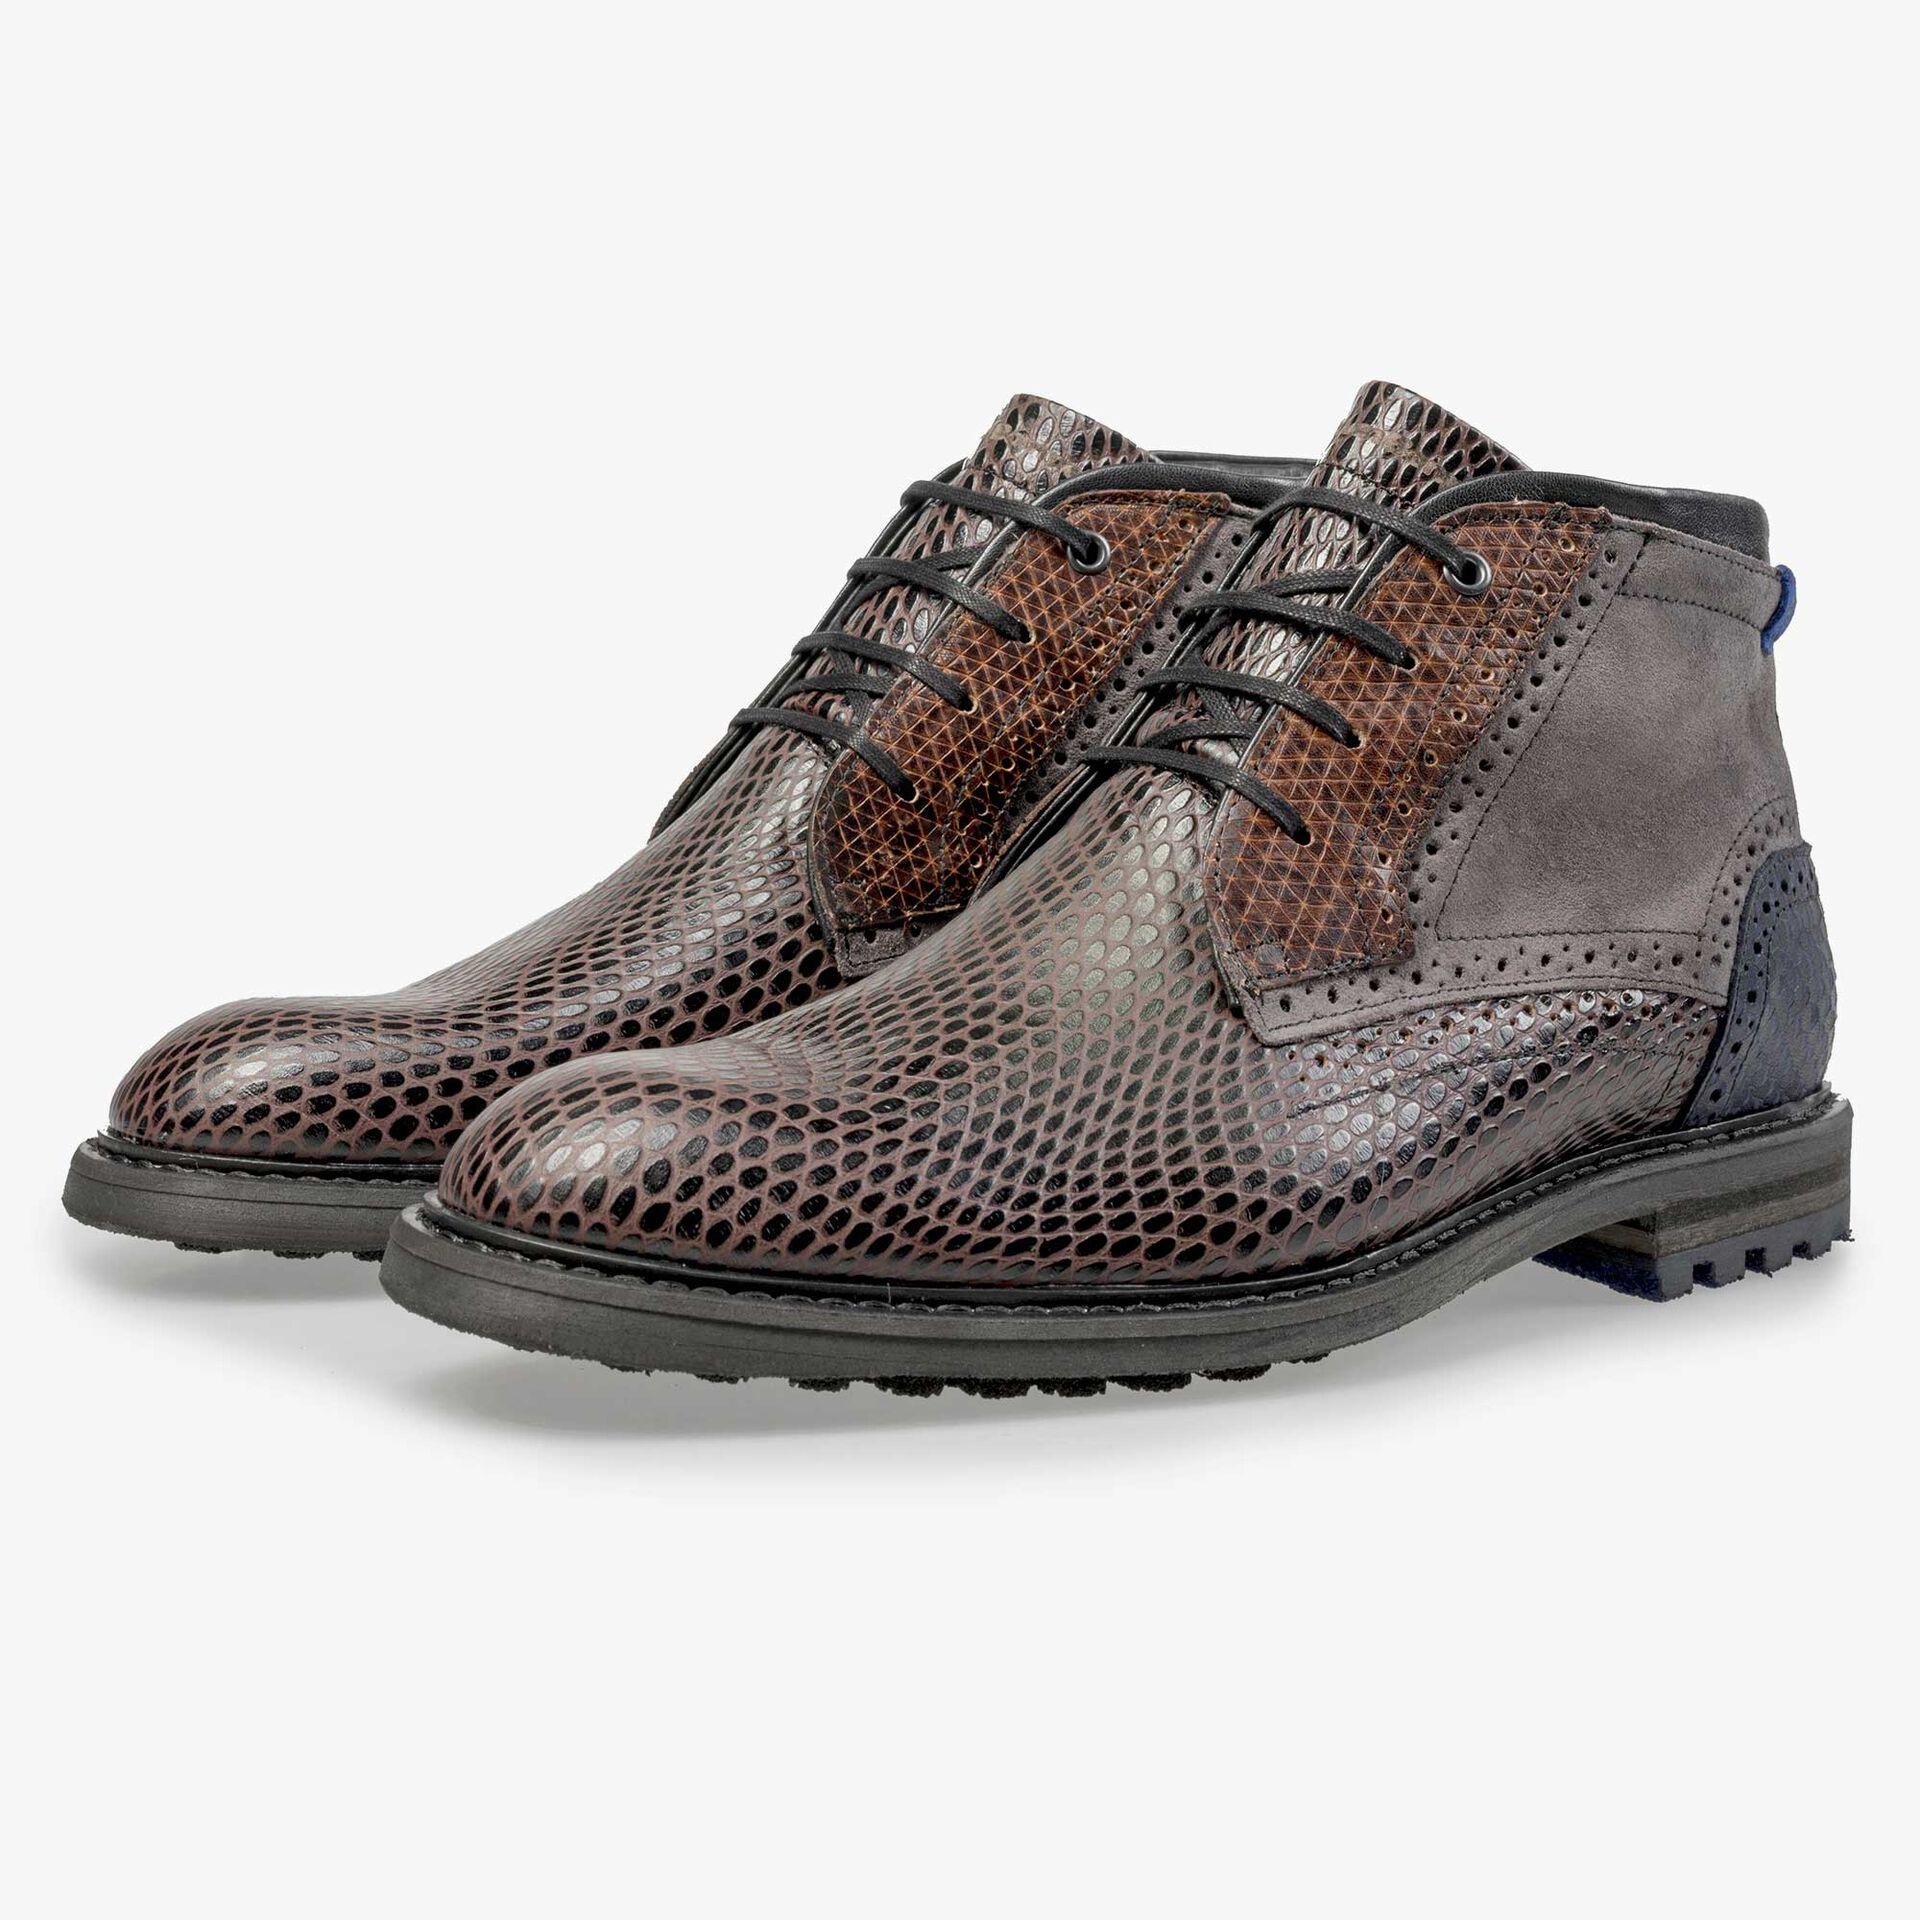 Floris van Bommel men's dark brown printed leather lace boot